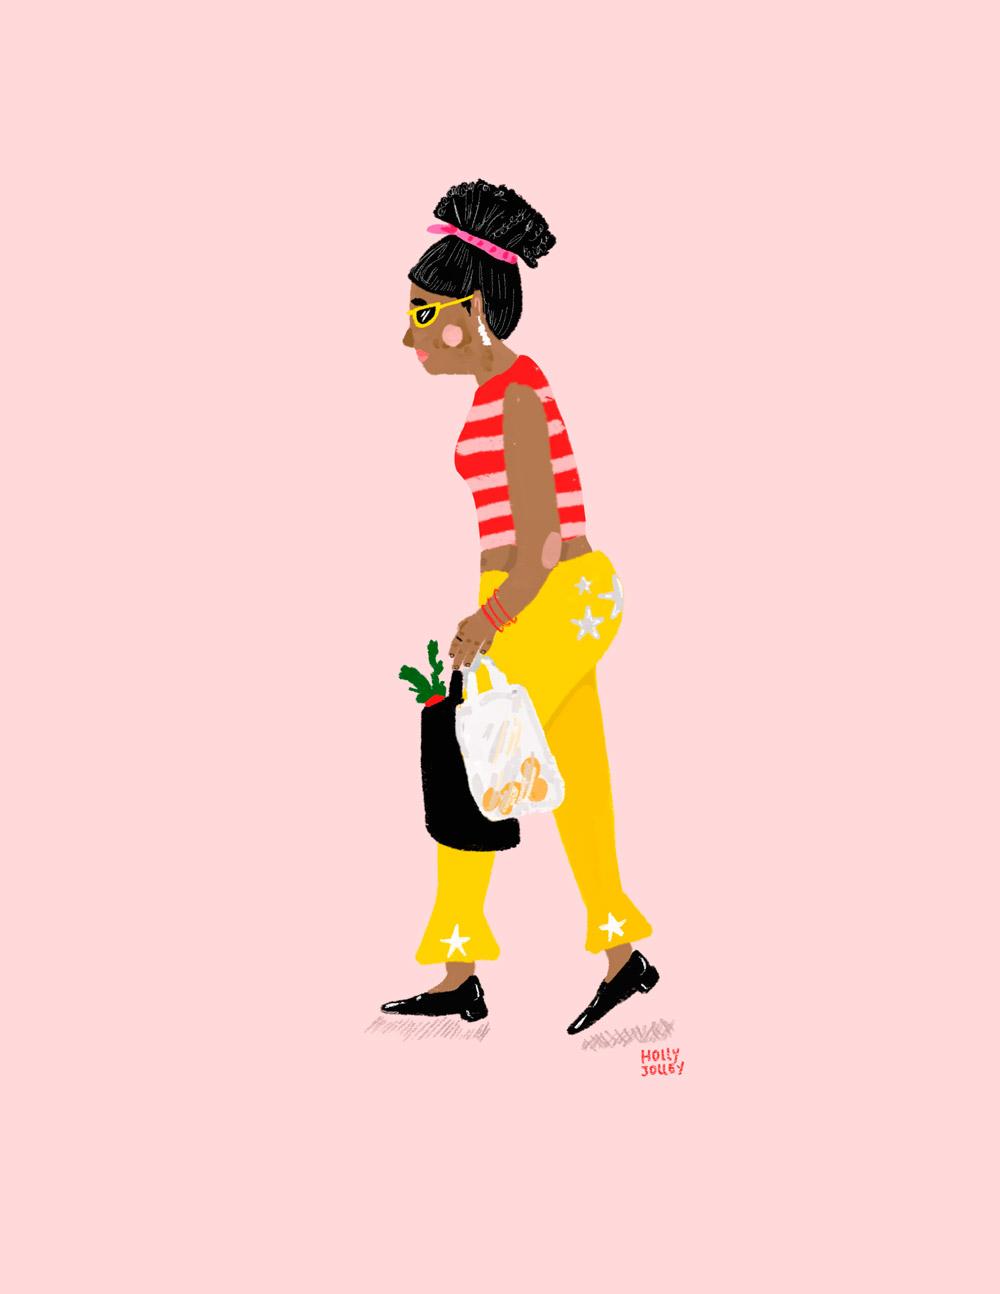 Ilustracion de Holly Jolley - Ilustradores chilenos por 2Design Blog